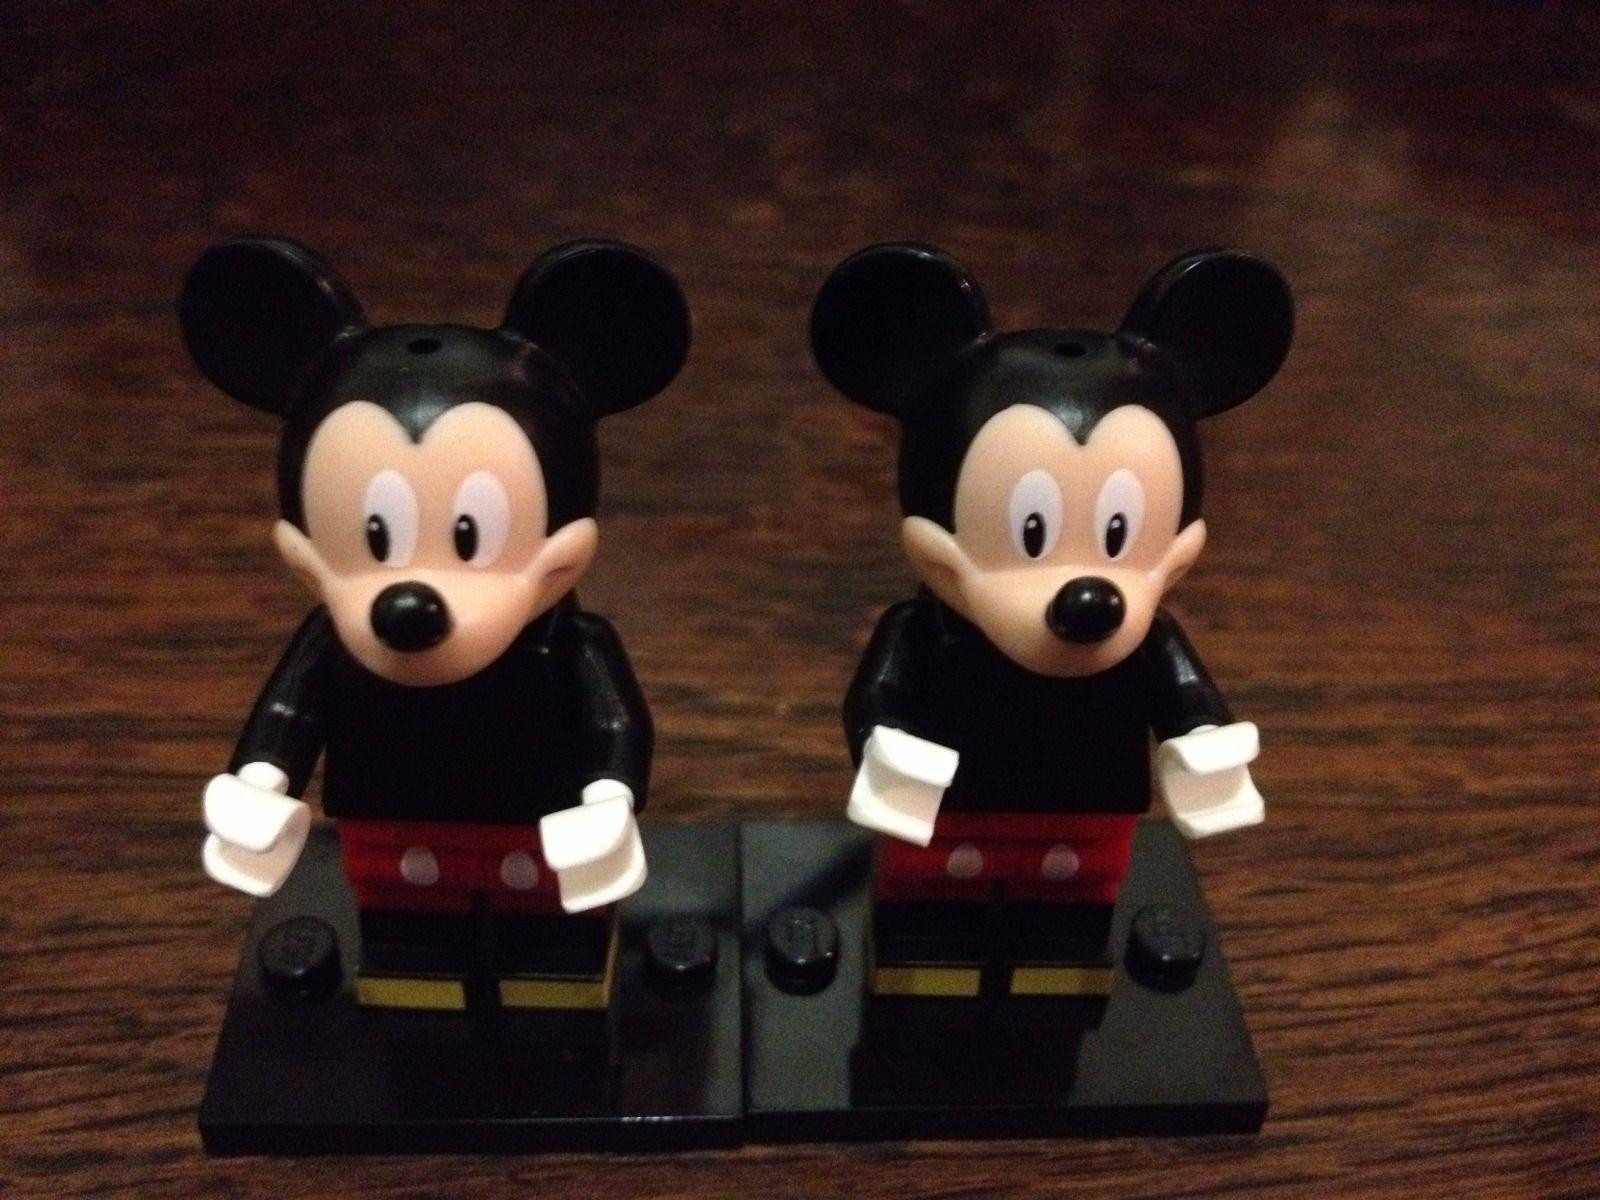 http://minifigpriceguide.com/wordpress/wp-content/uploads/2016/05/Lego-71012-Disney-Mickey-Mouse-Eye-Misprint-2.jpg